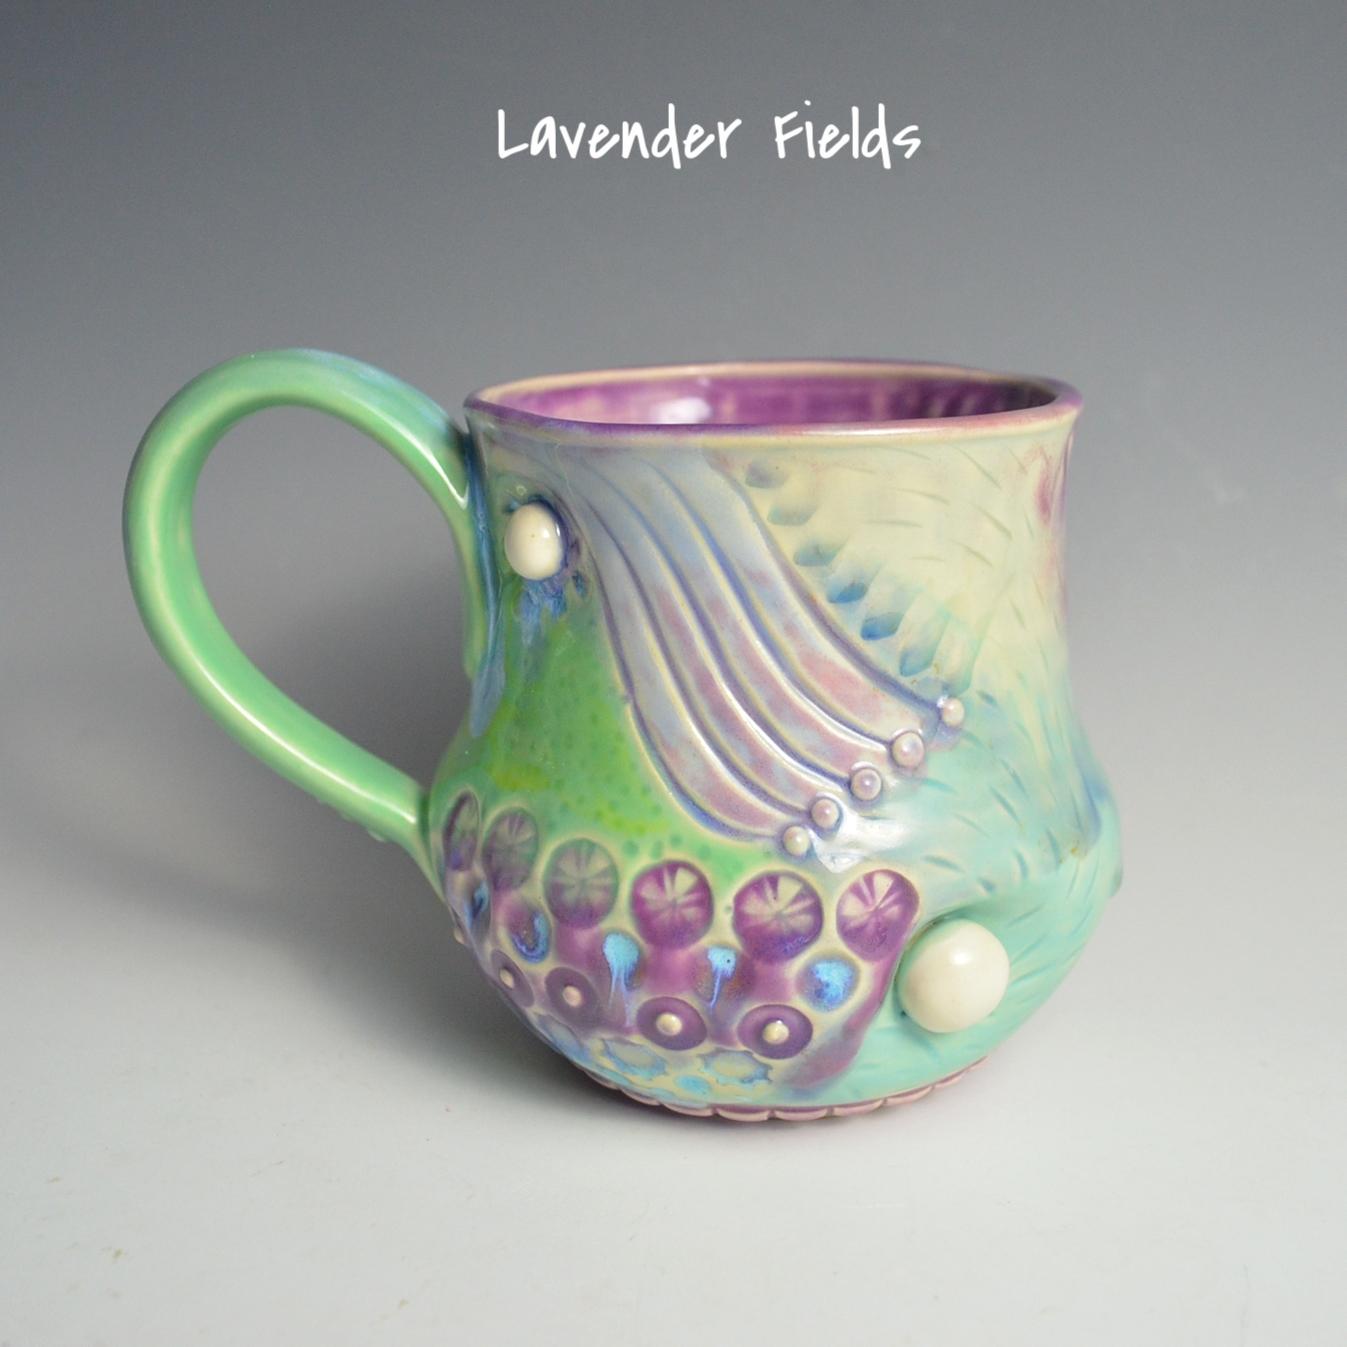 2674 - #4 Lavender Fields.JPG